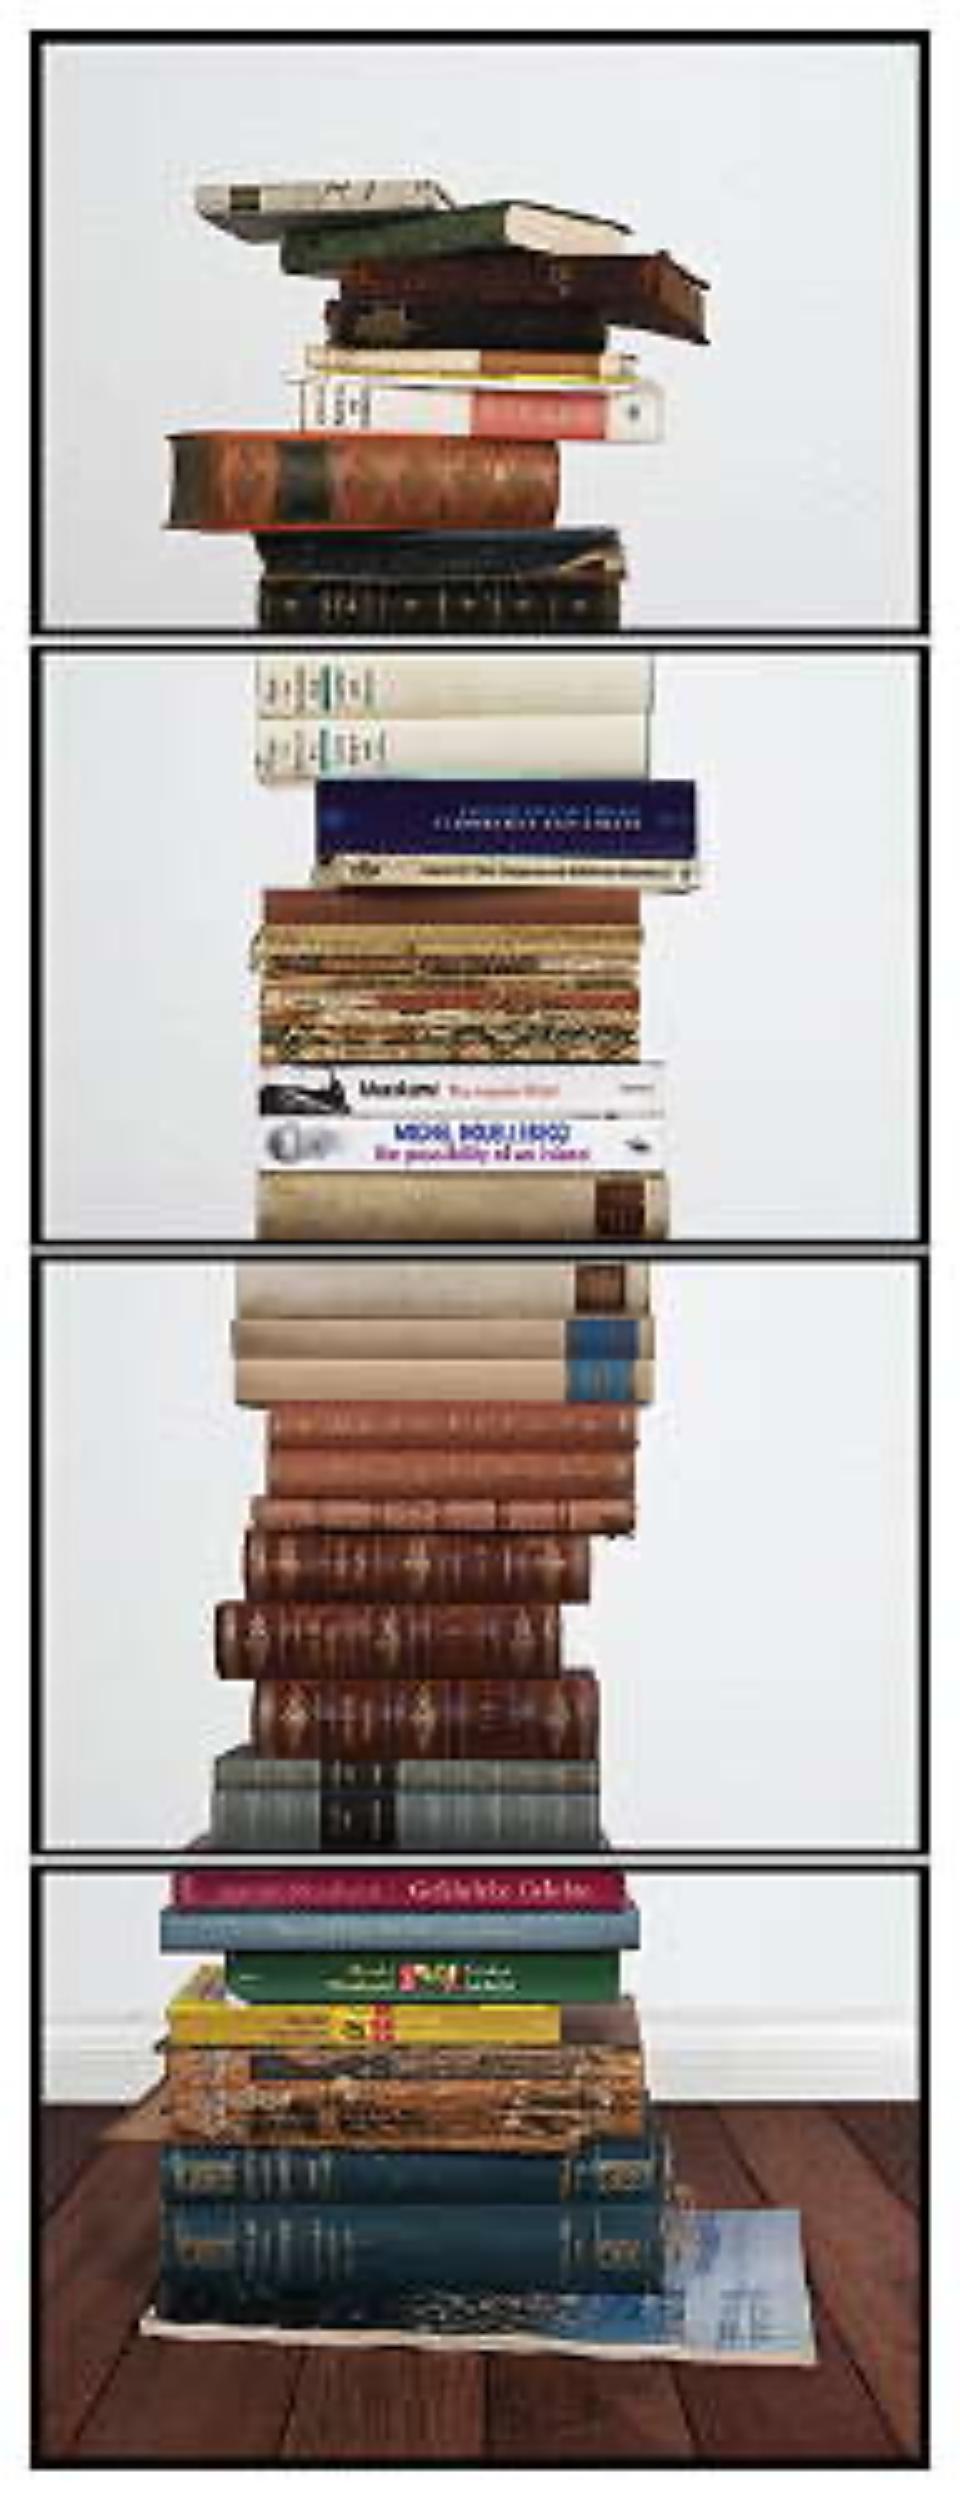 Joachim Froese: Critical Mass #7 2008 4 archival pigment inkjet prints 124 x 46 cm Ed. 12